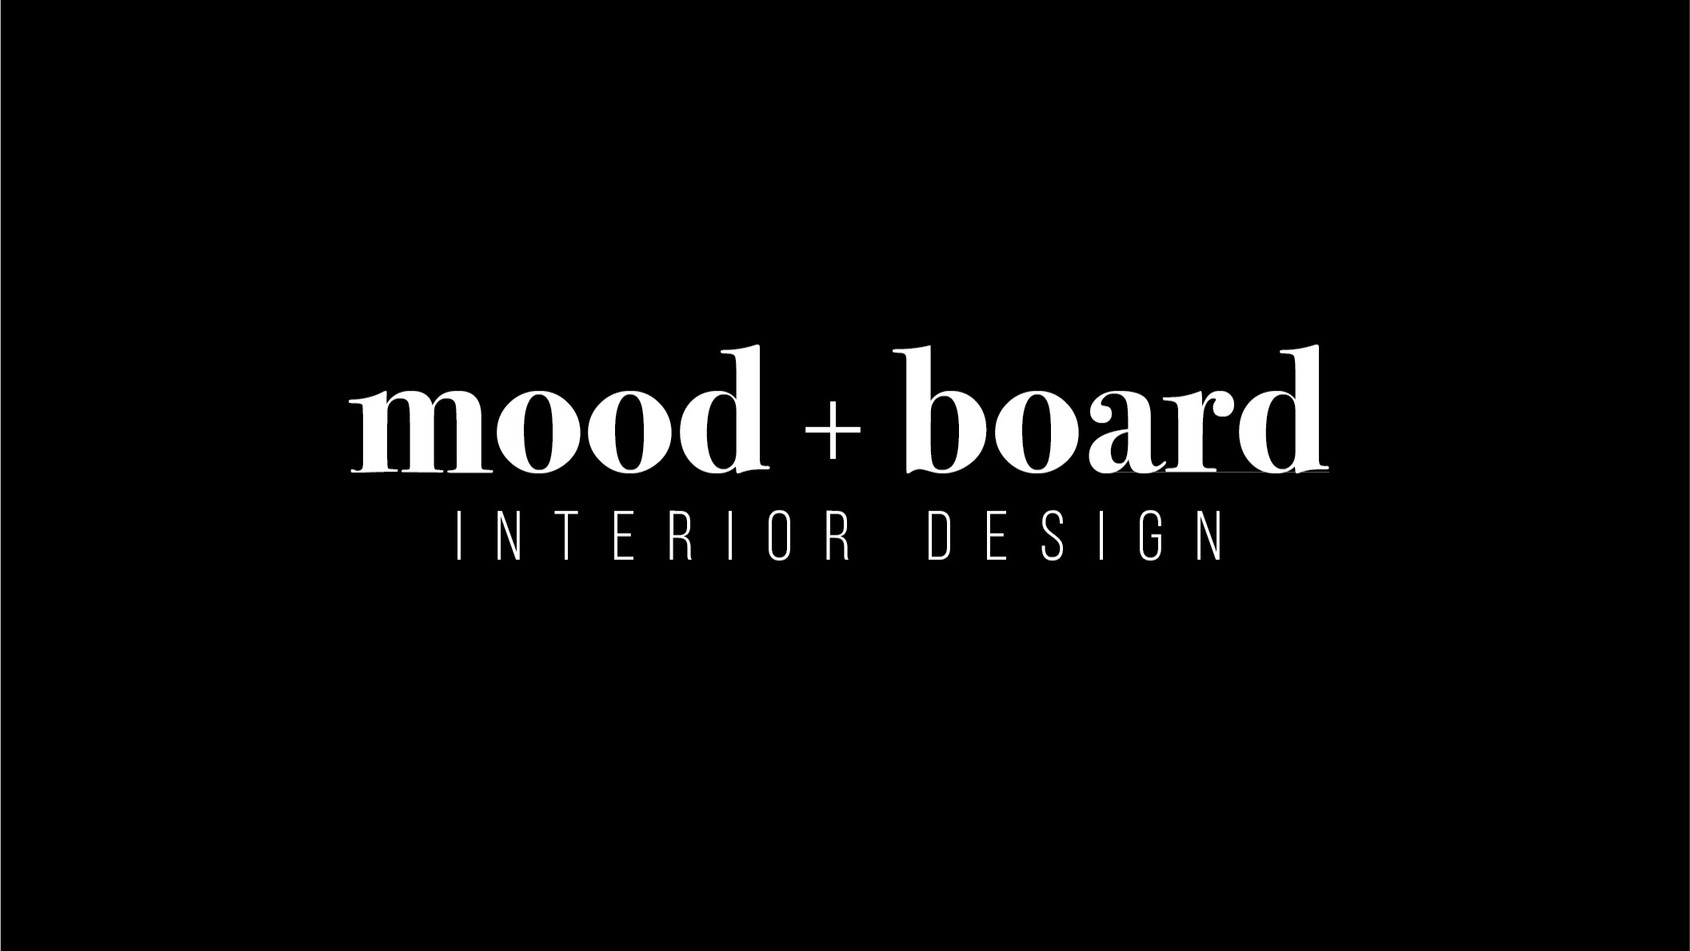 mood%20%2B%20board-03_edited.jpg